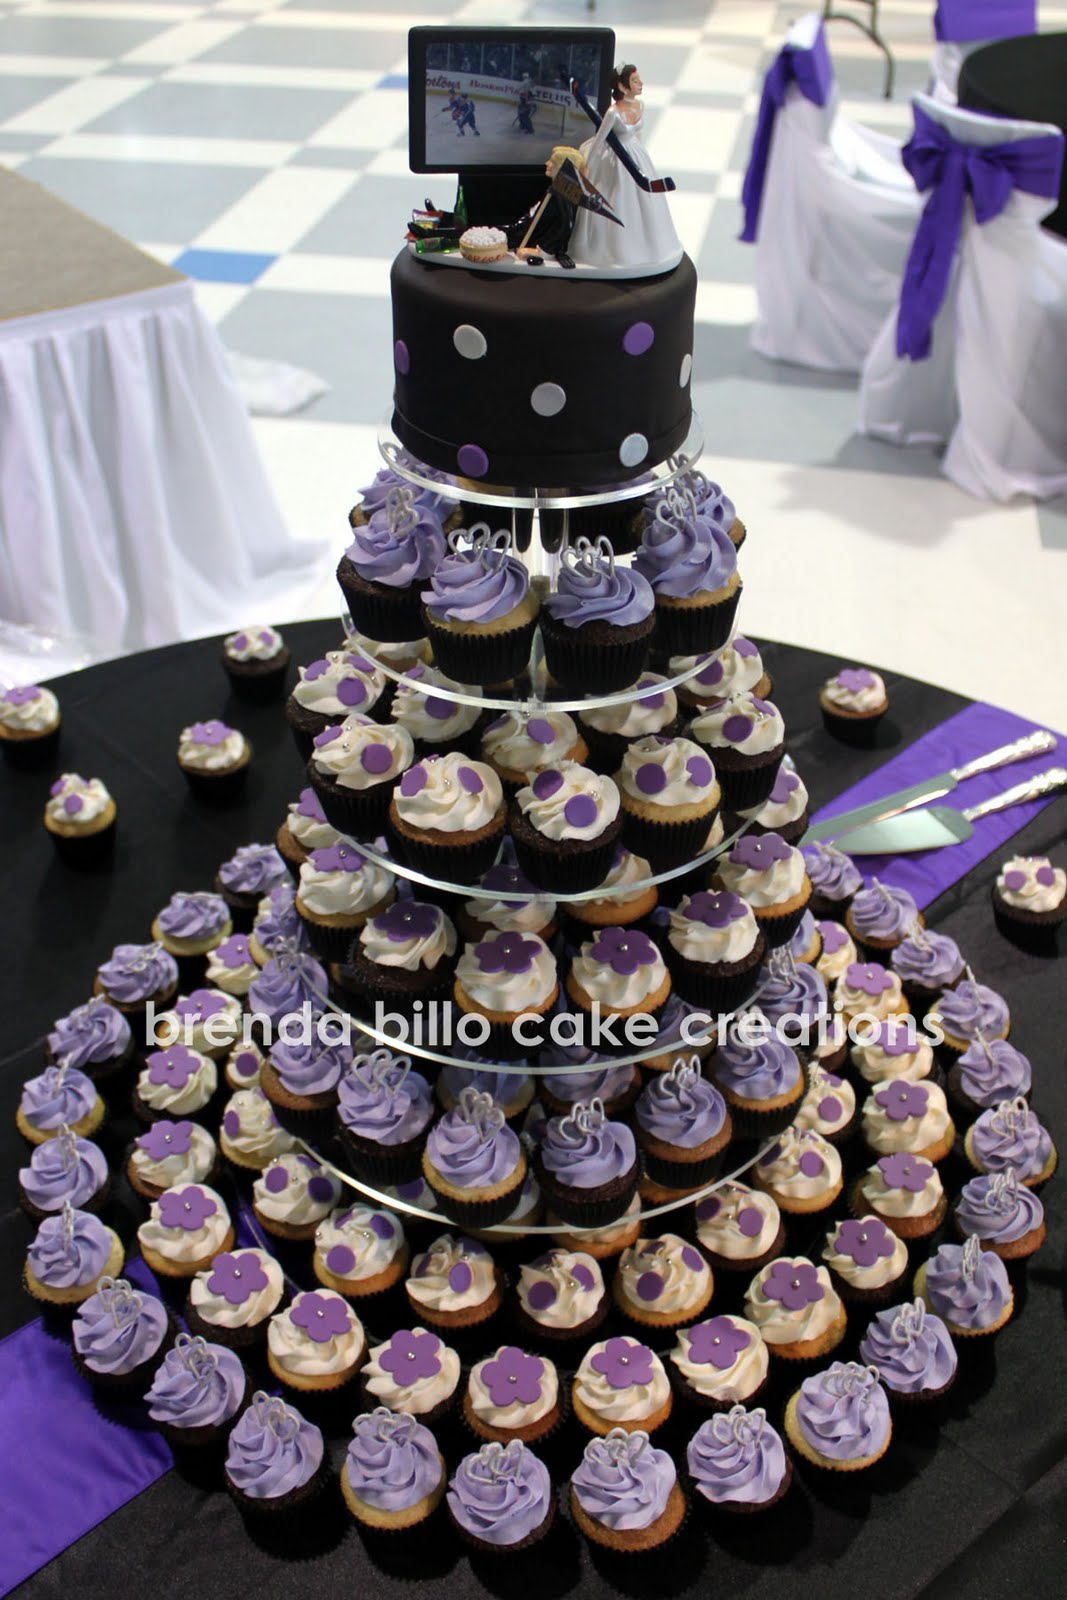 Brenda Billo Cake Creations Purple Amp Black Cupcakes